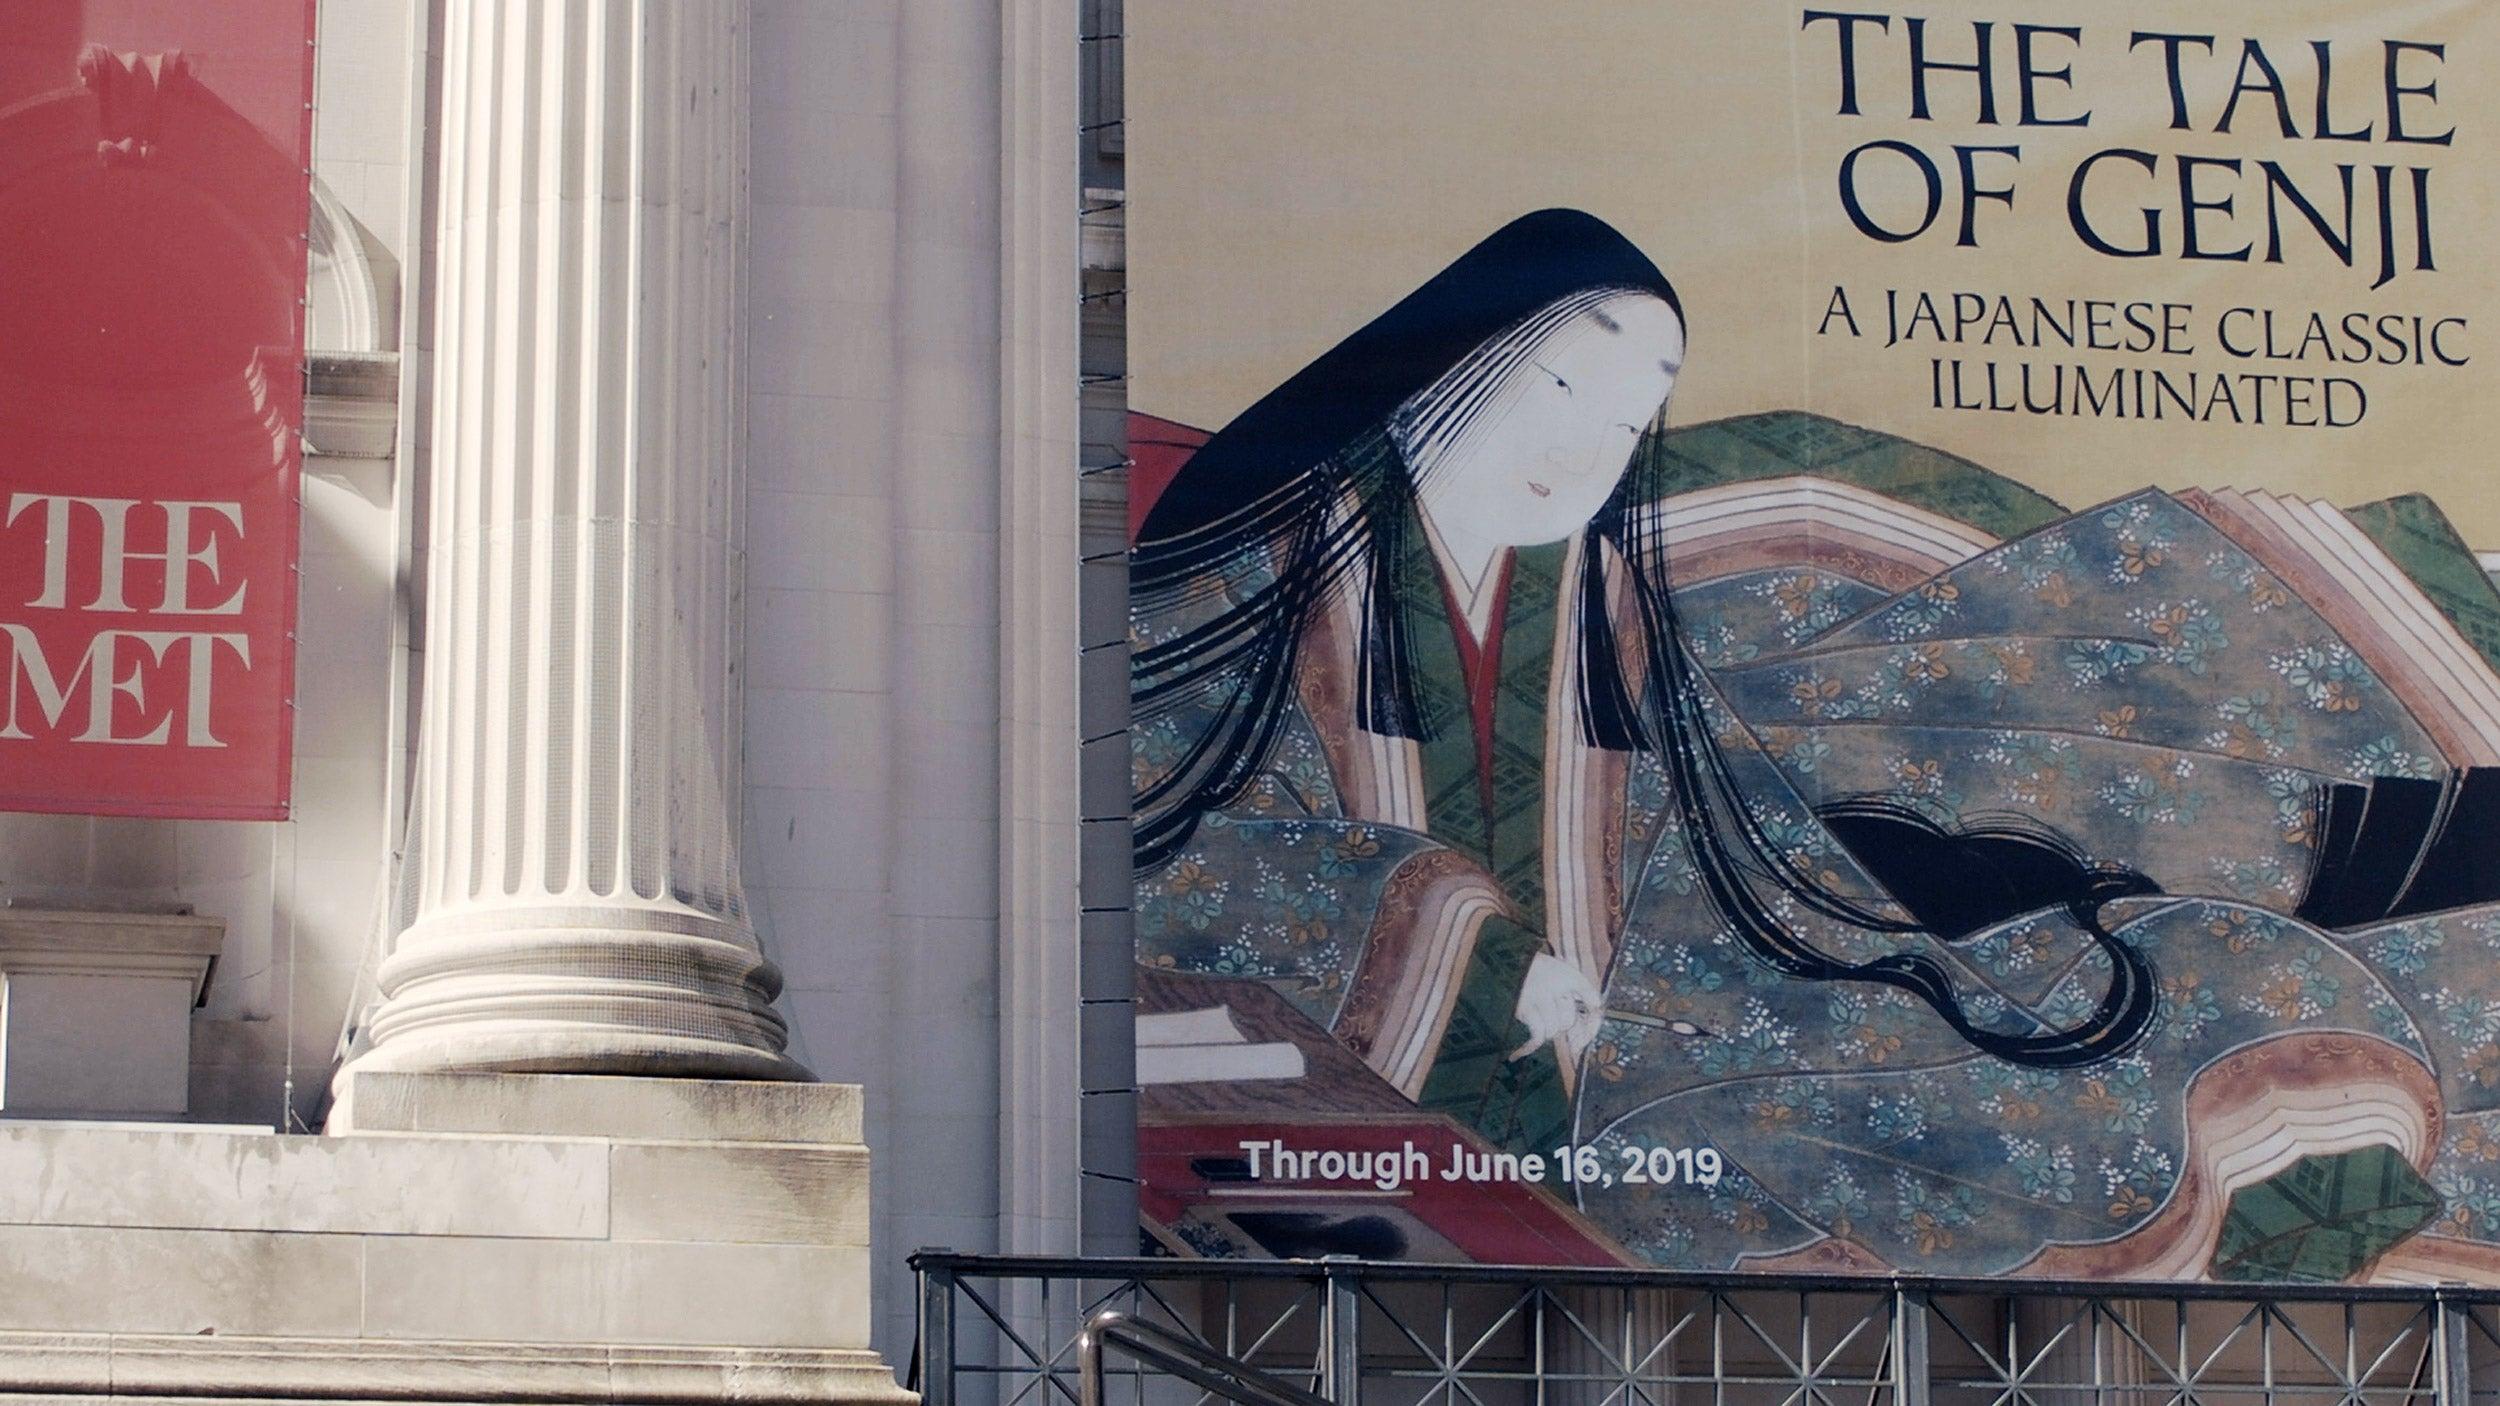 Banner advertising Gengi exhibit outside the Met